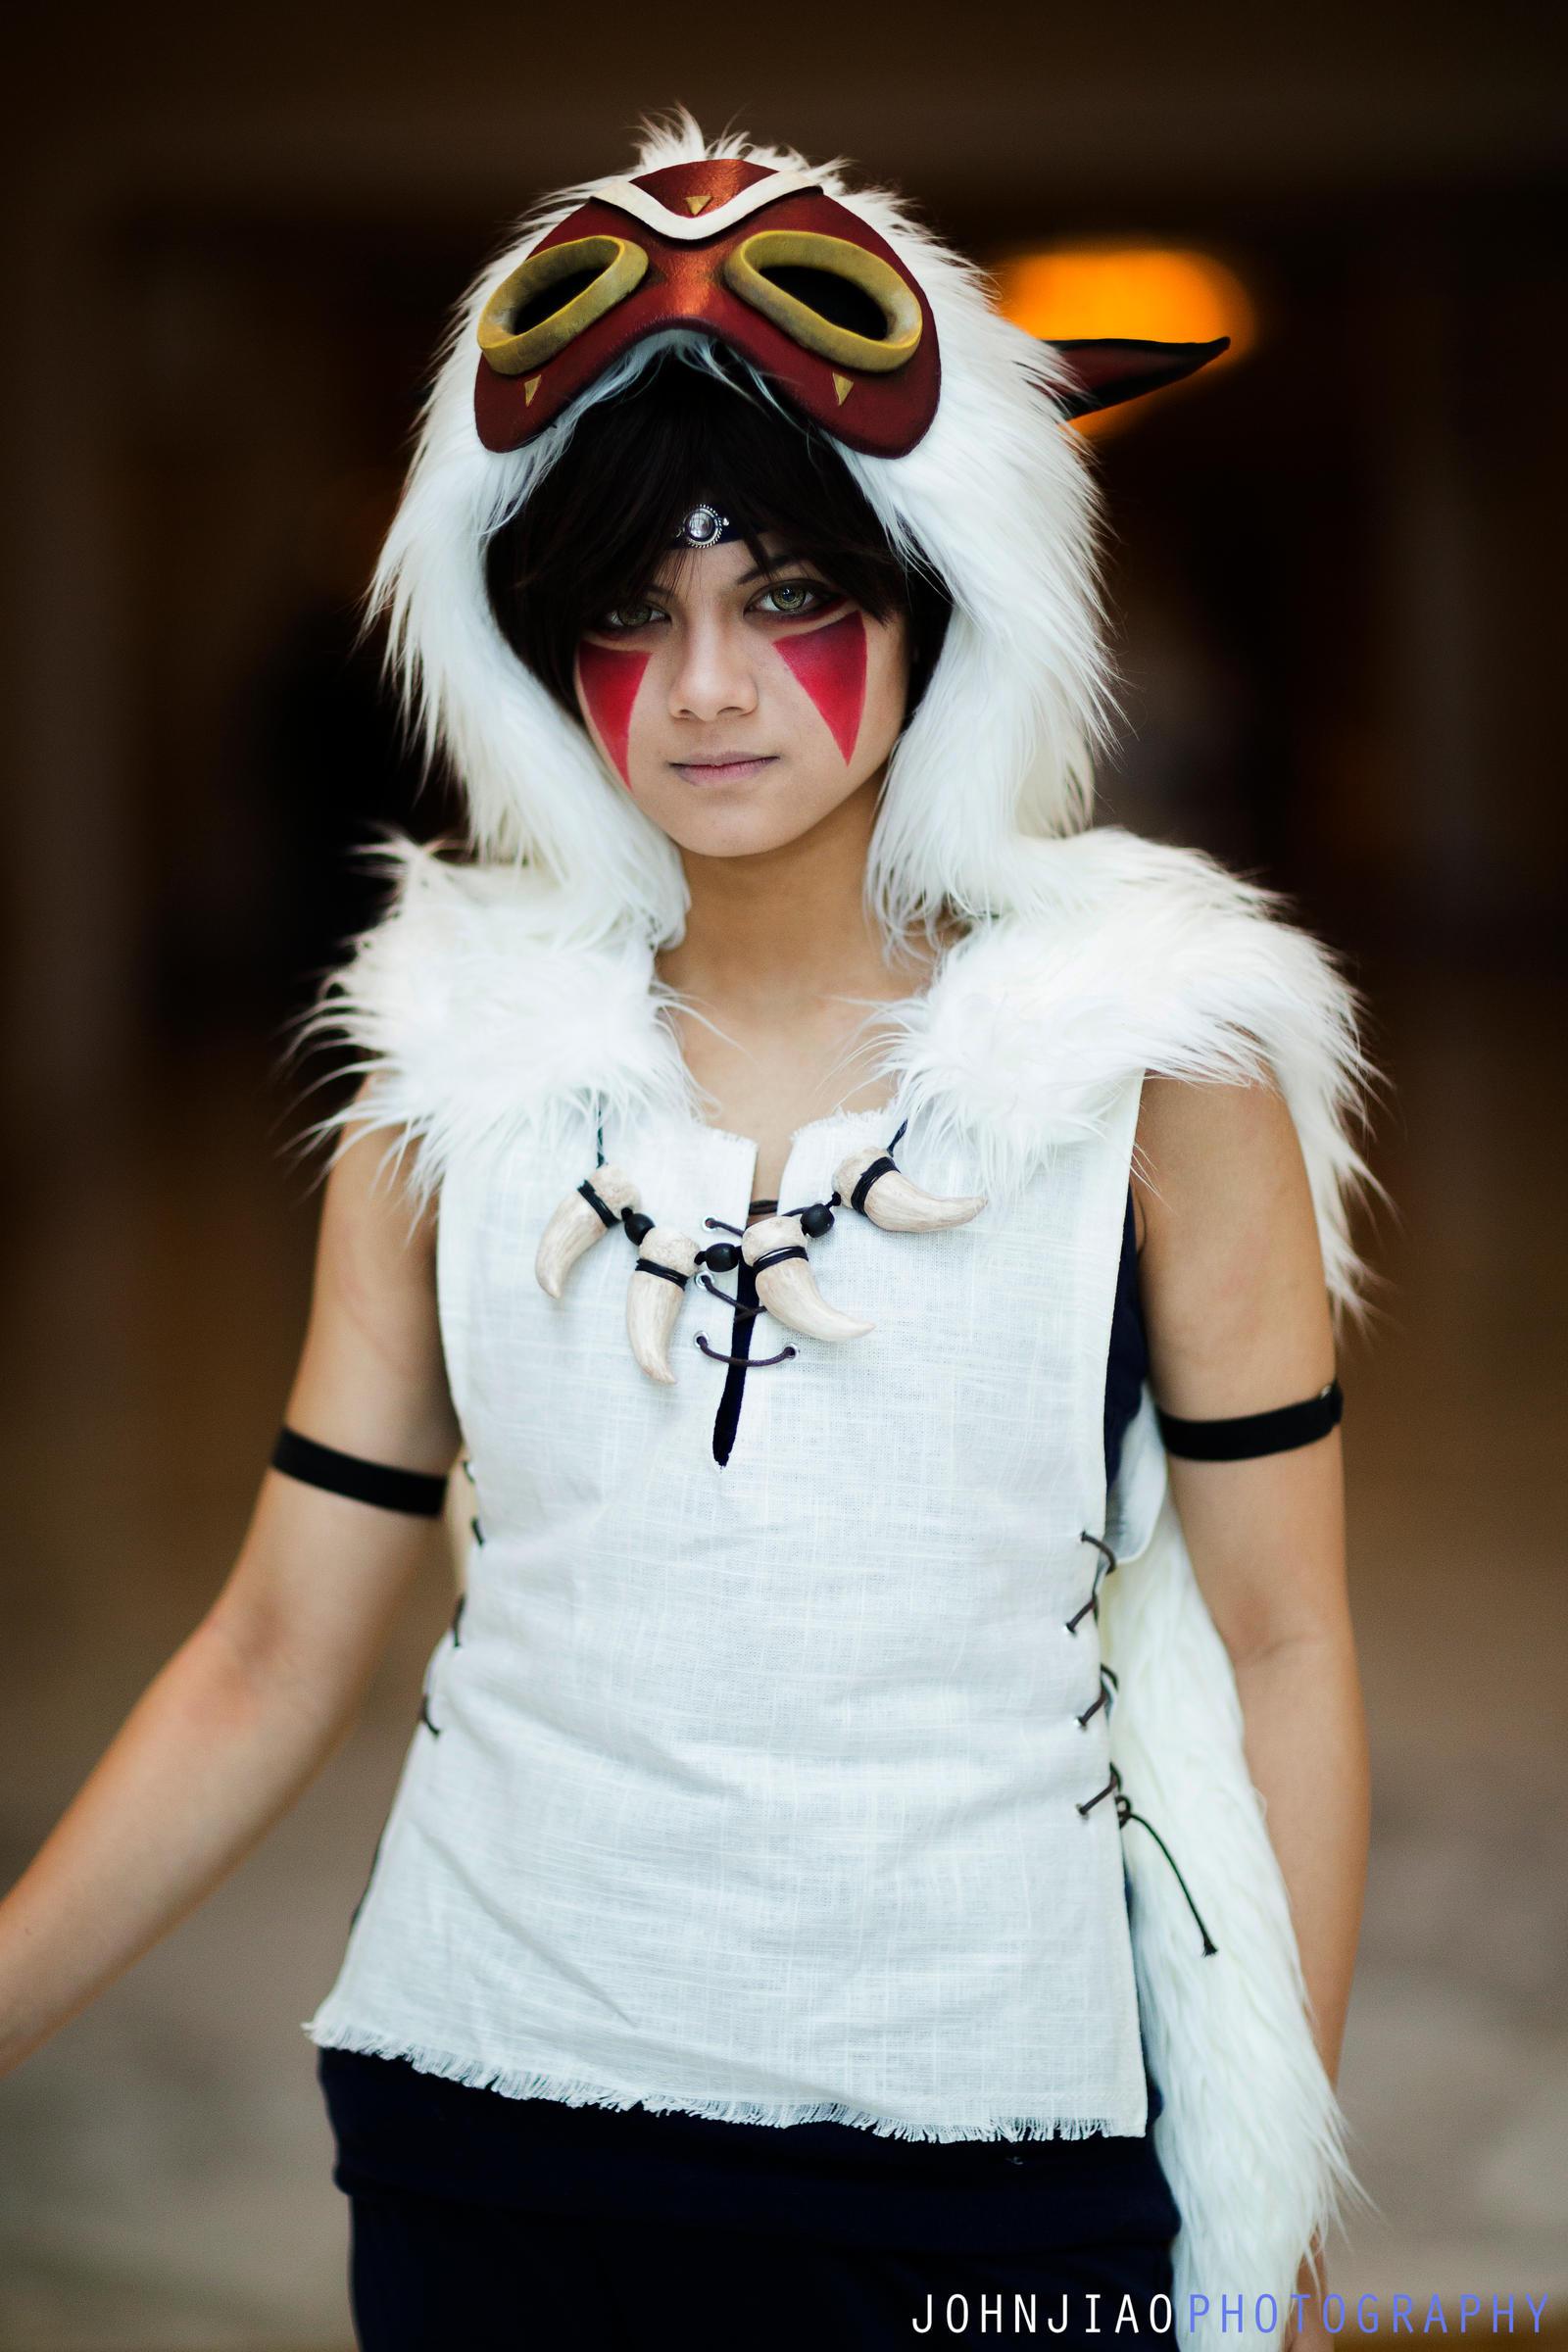 Princess Mononoke cosplay by JohnJiaoPhotography on DeviantArt